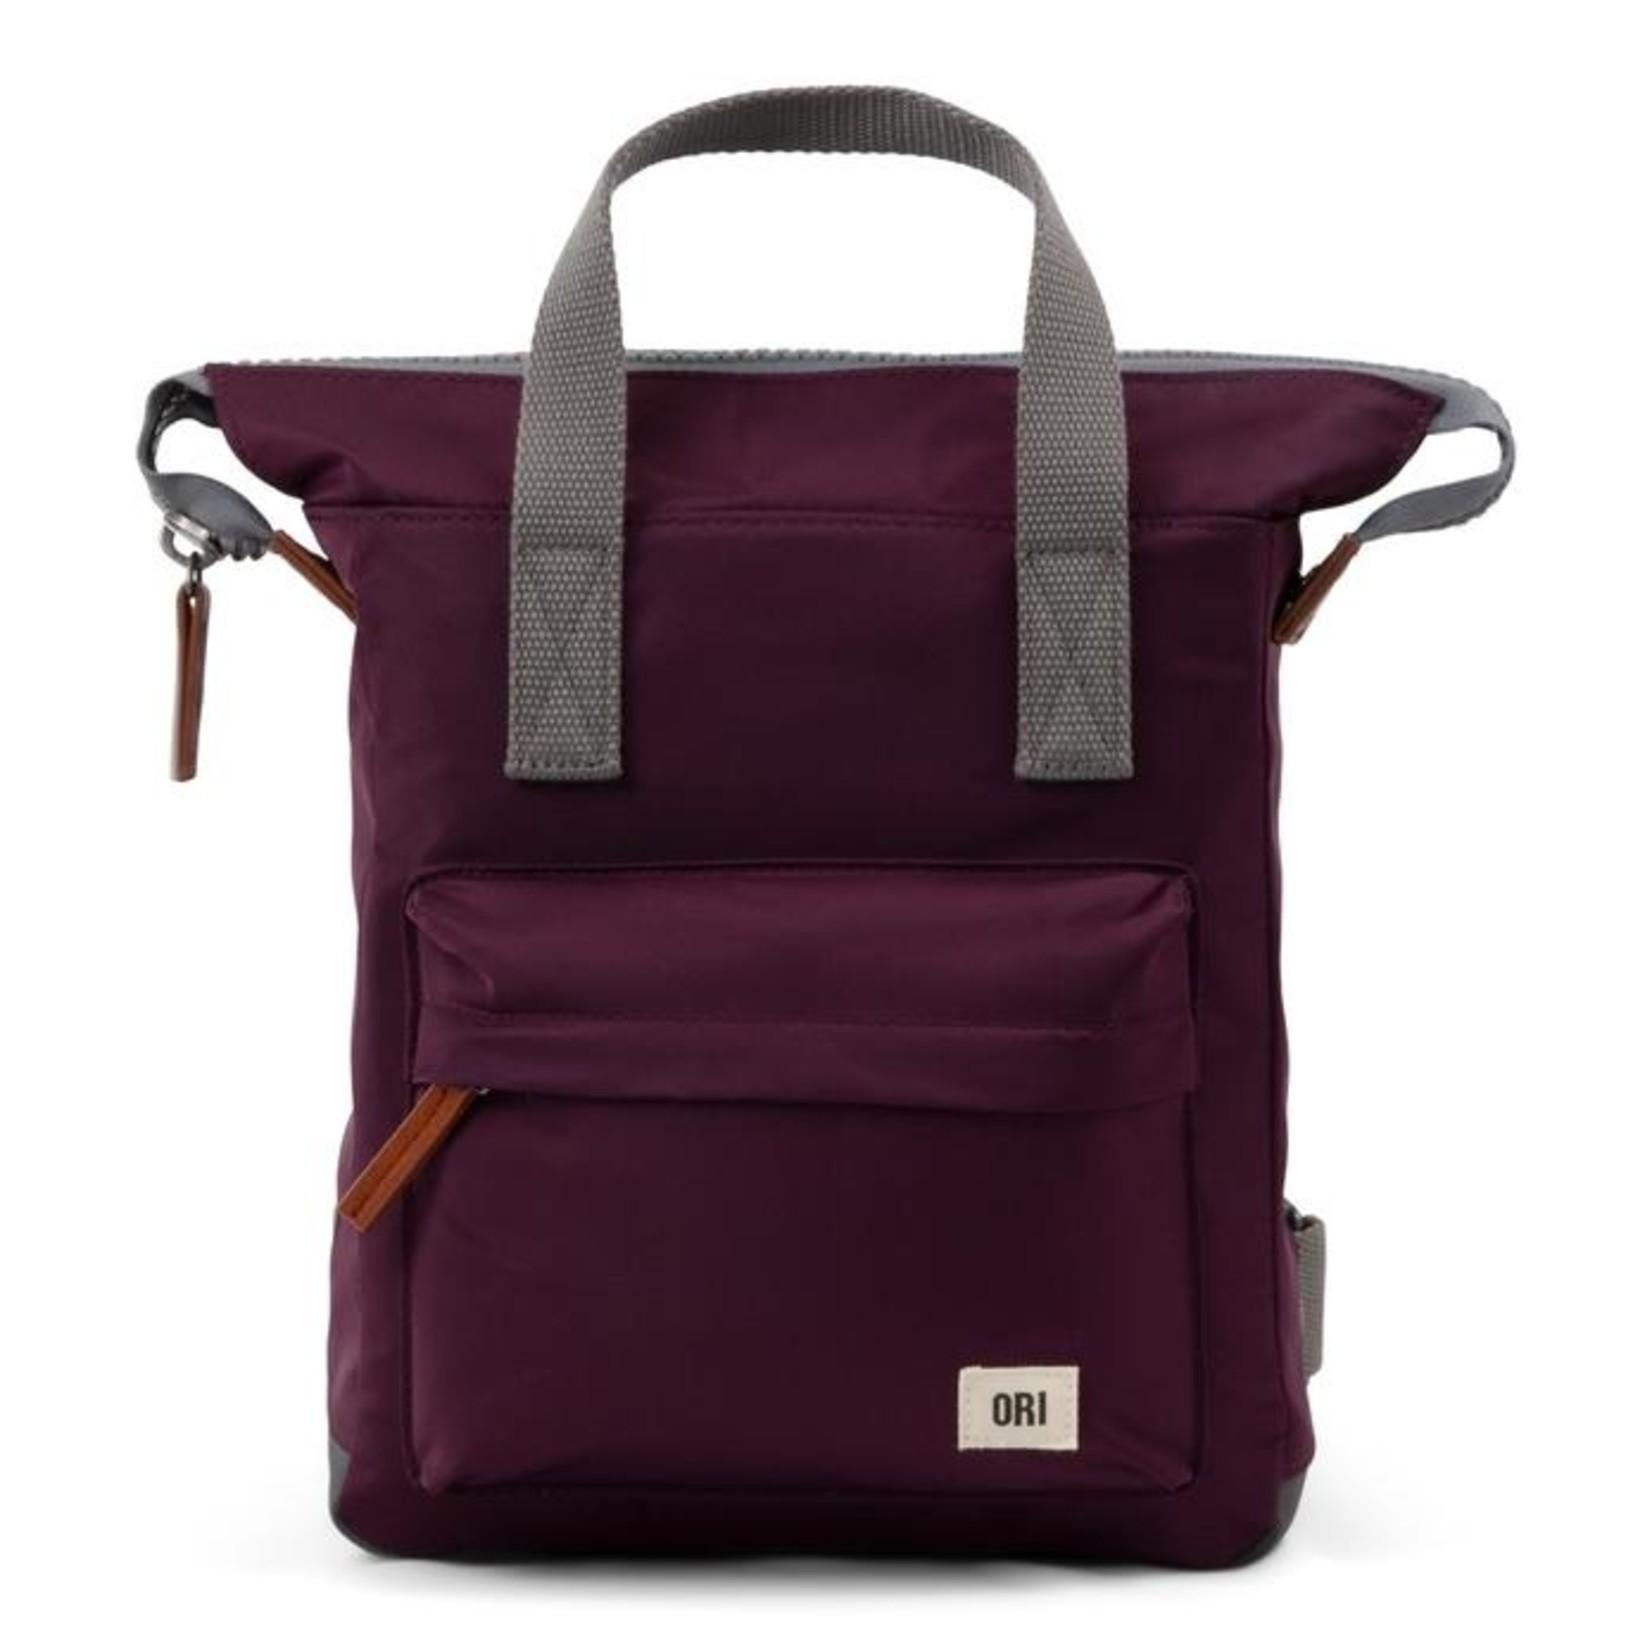 Ori London Bantry B Small Backpack Plum